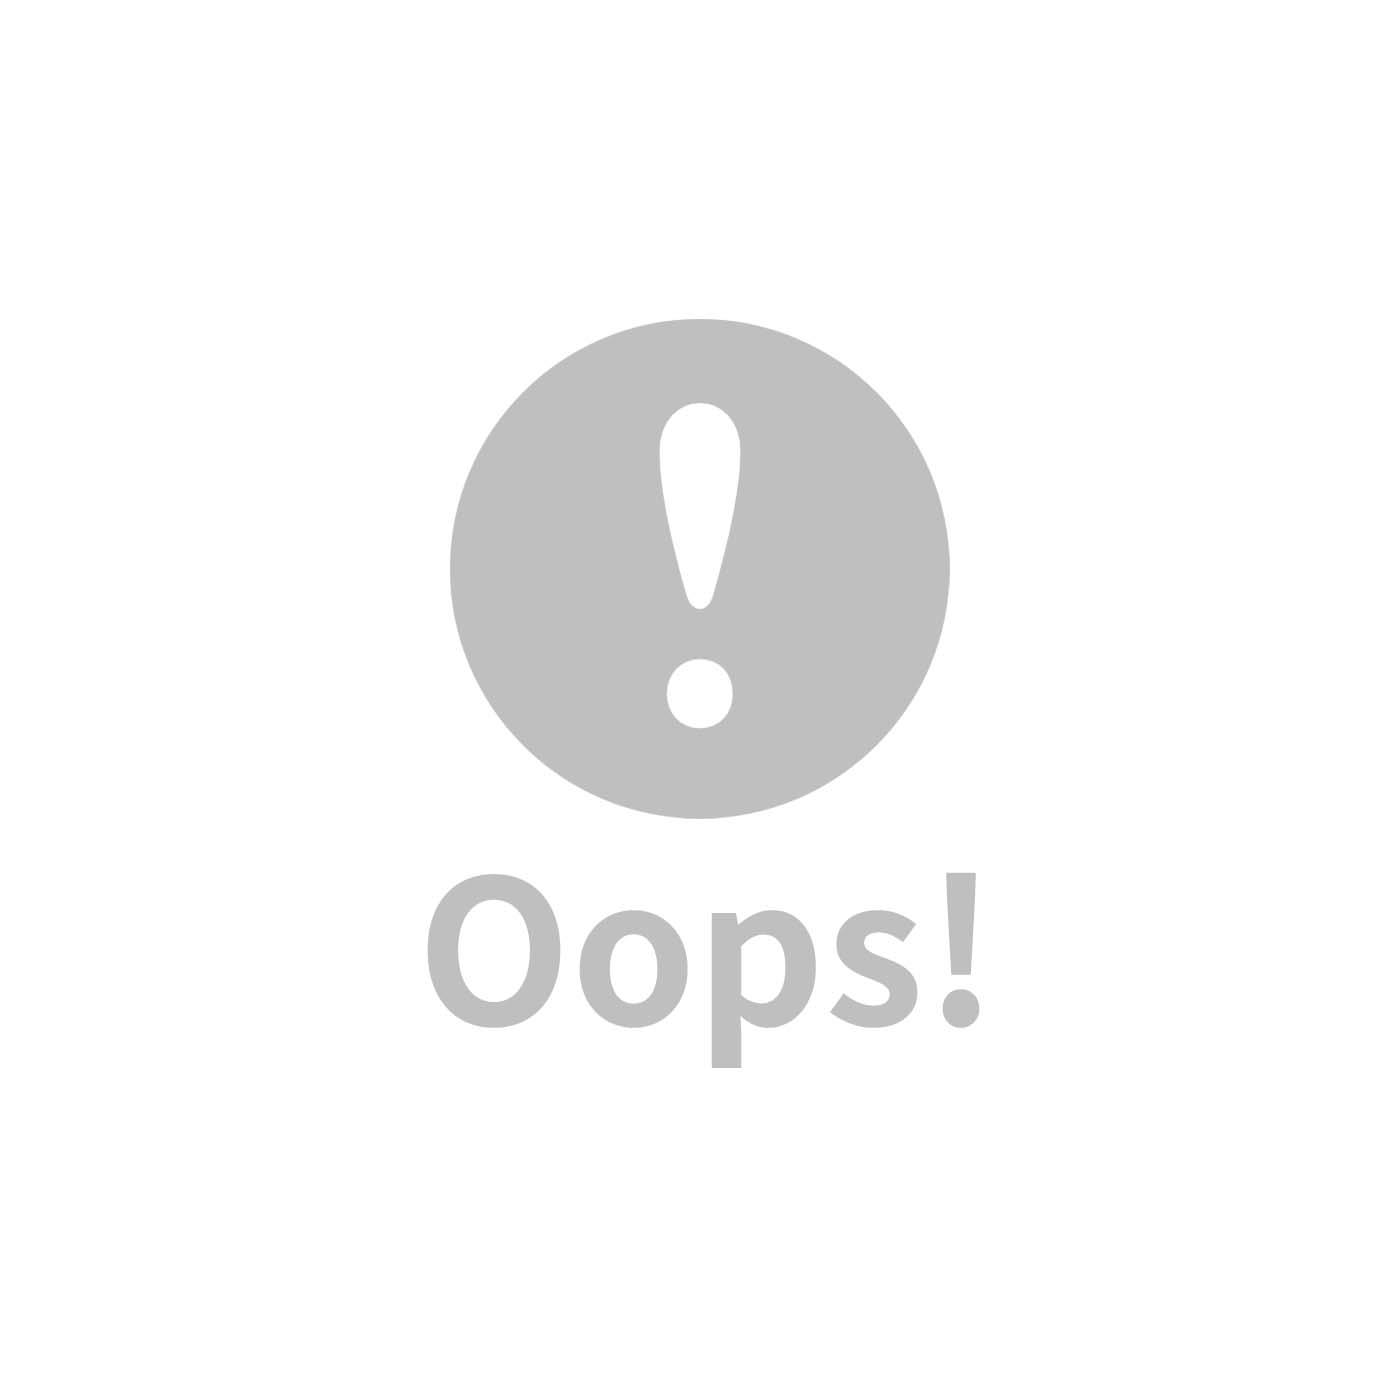 air cossi 透氣抗菌天絲嬰兒床墊(輕柔藍)